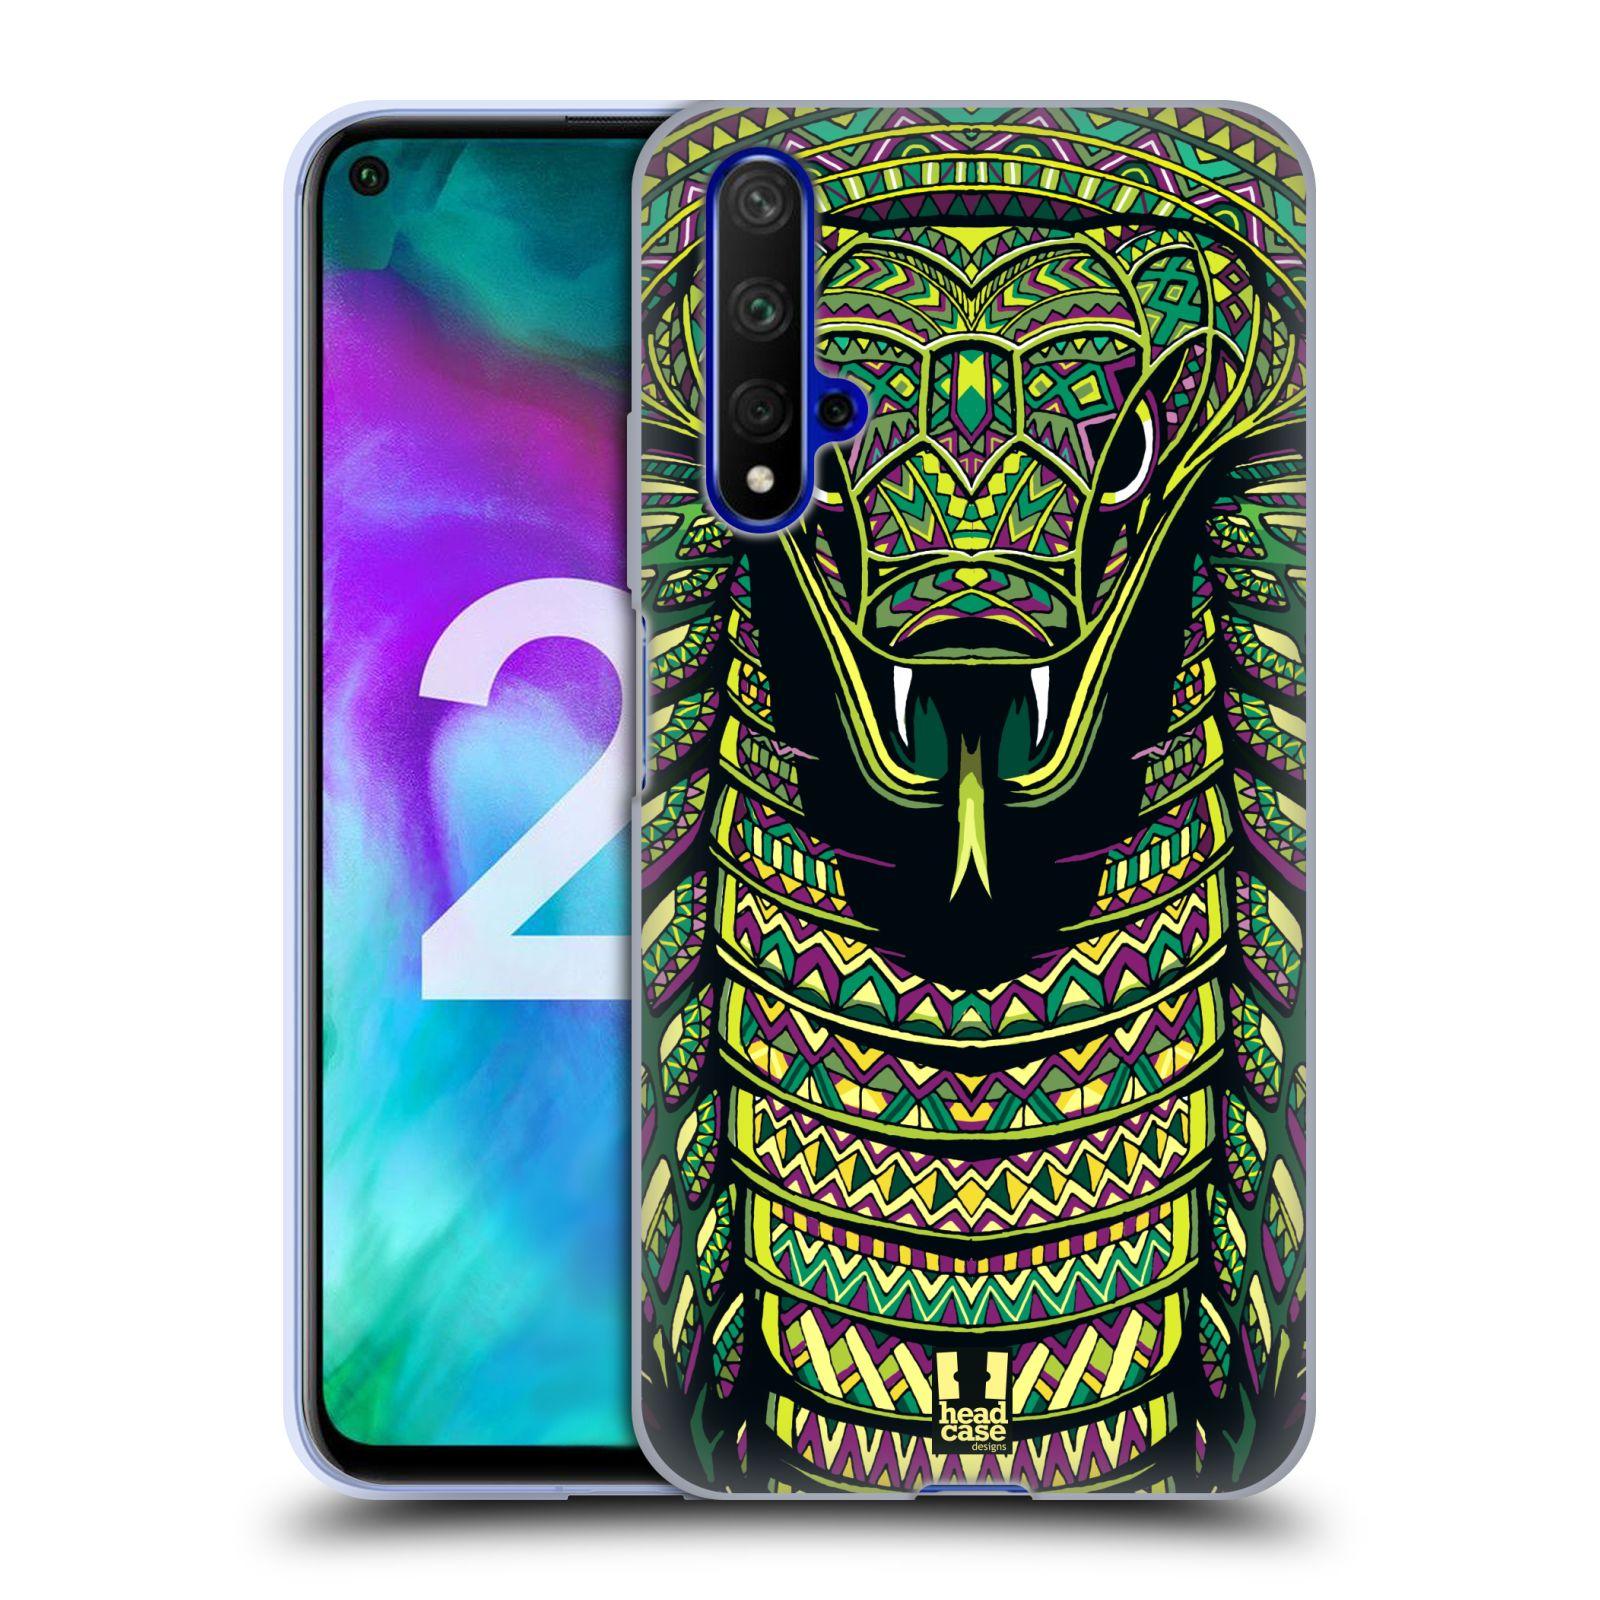 Silikonové pouzdro na mobil Honor 20 - Head Case - AZTEC HAD